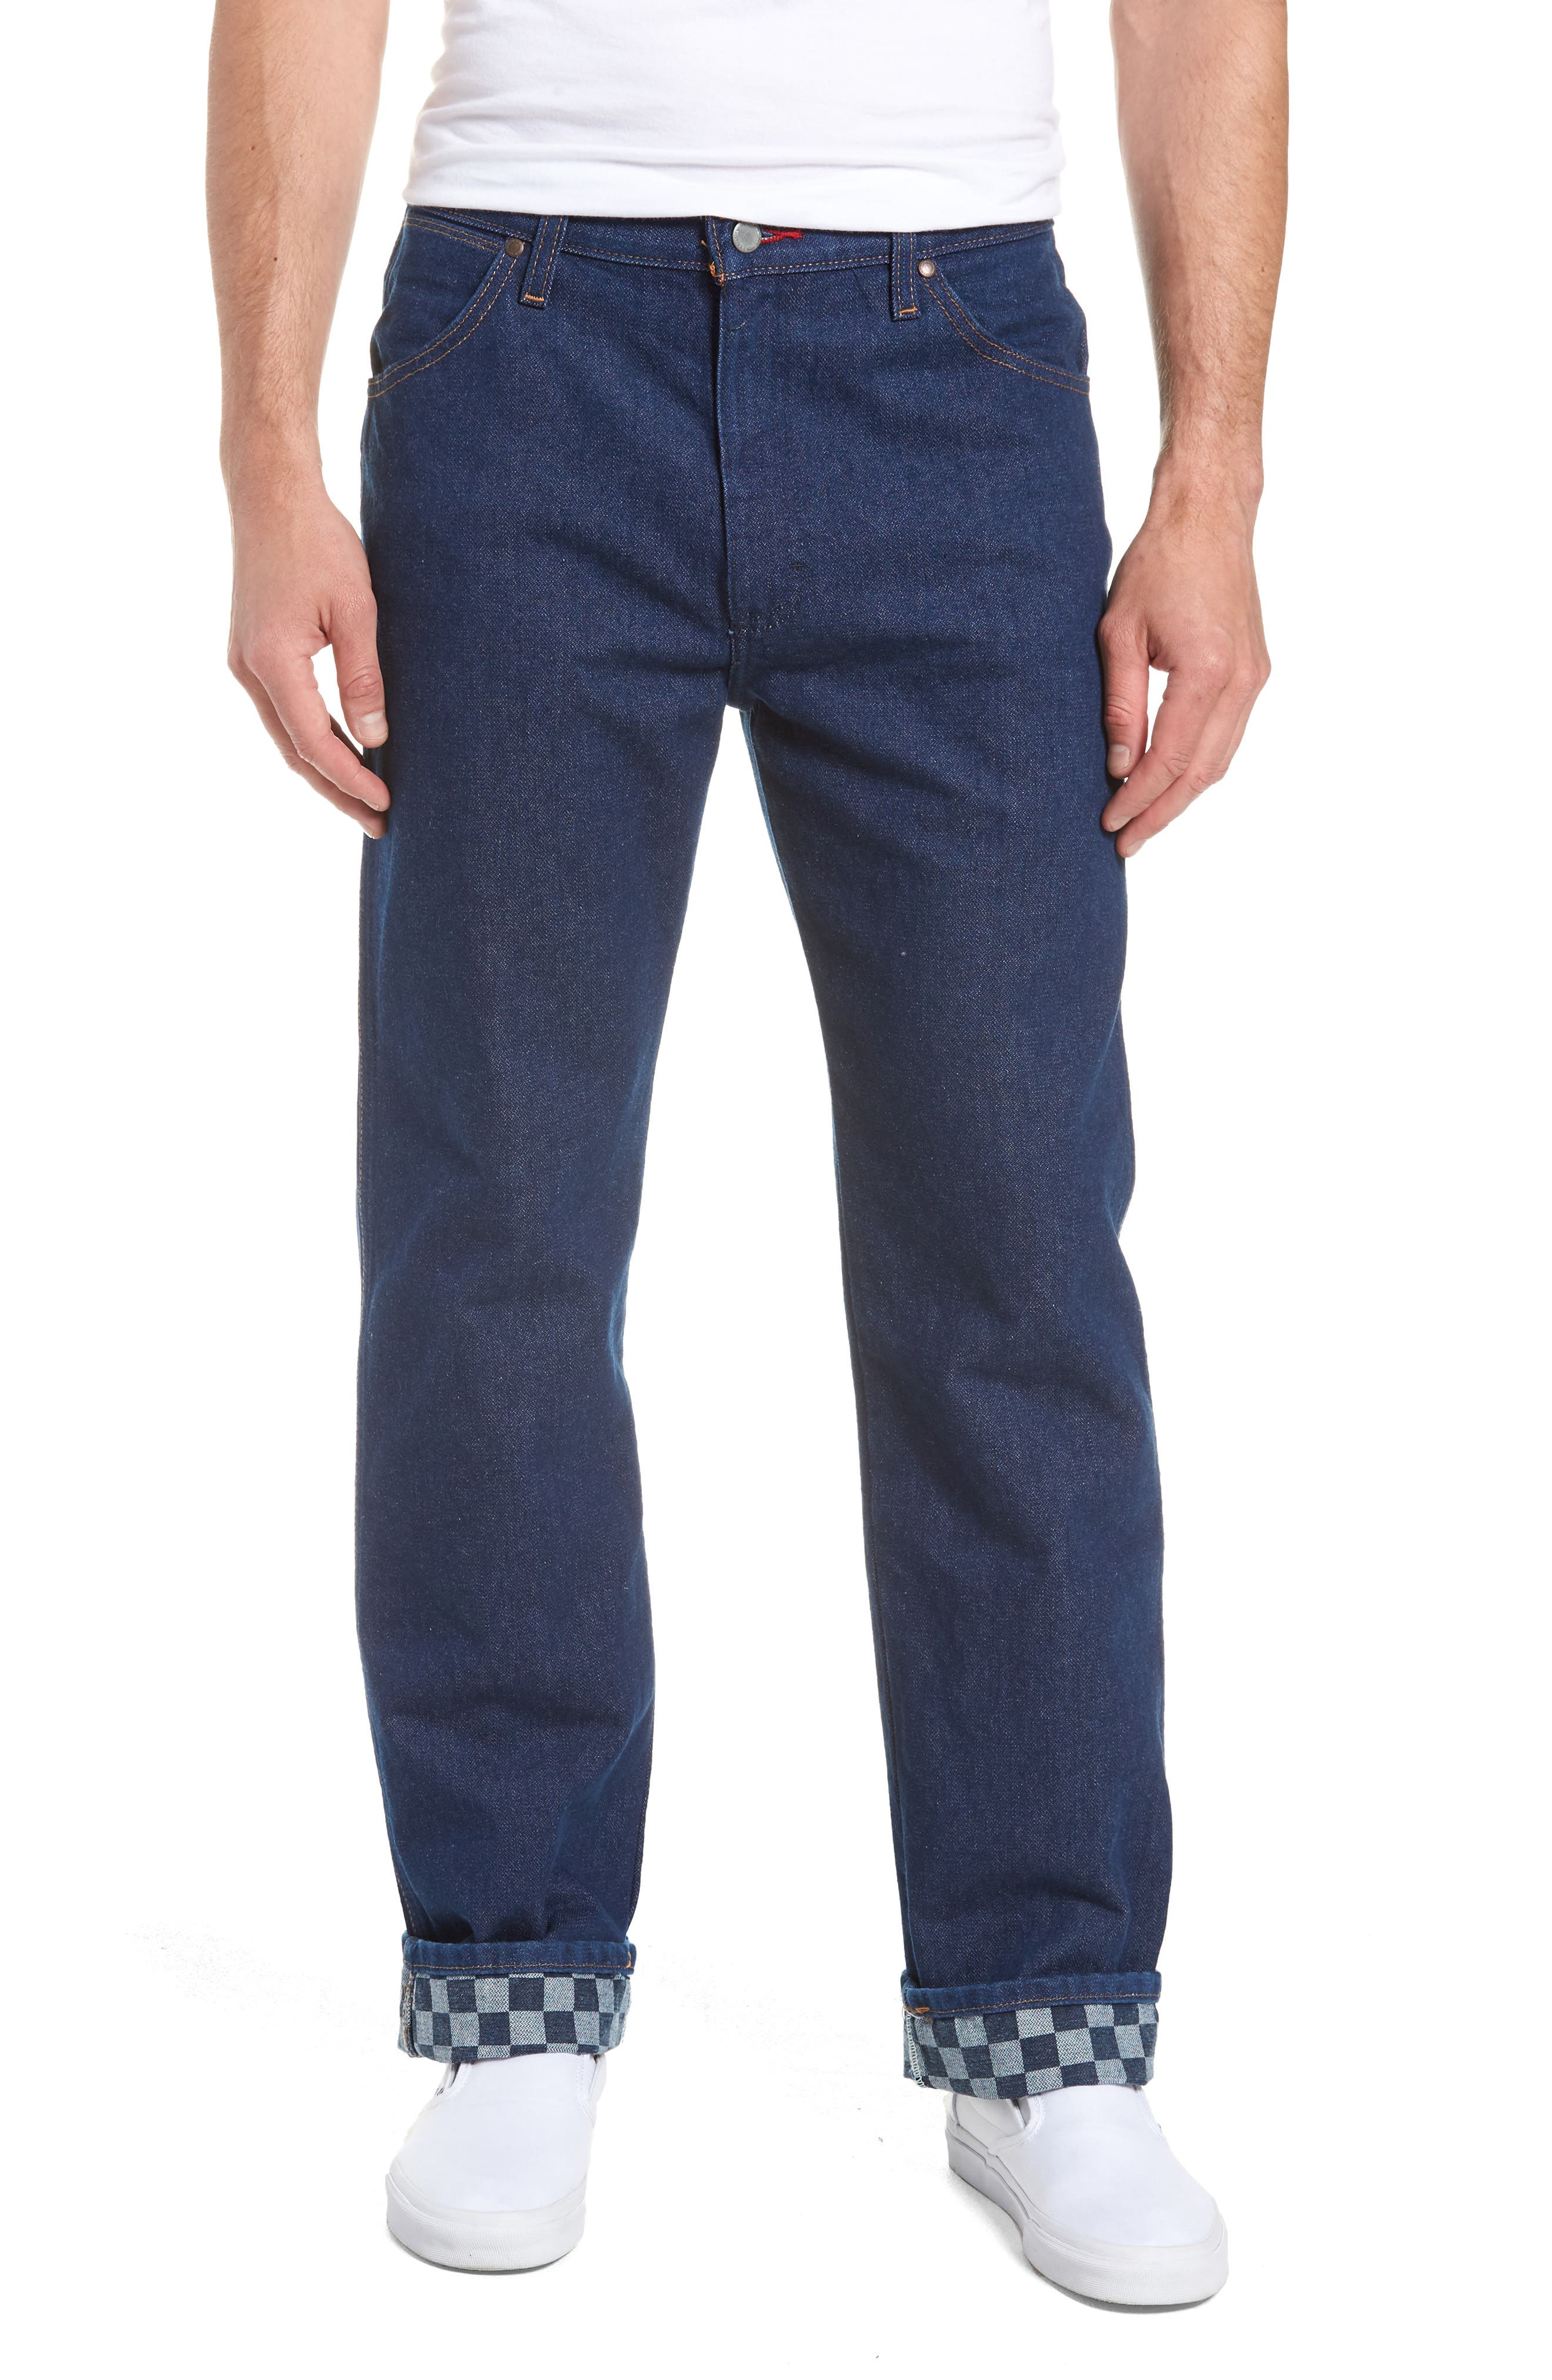 x Wrangler Straight Leg Jeans,                         Main,                         color, PREWASH INDIGO